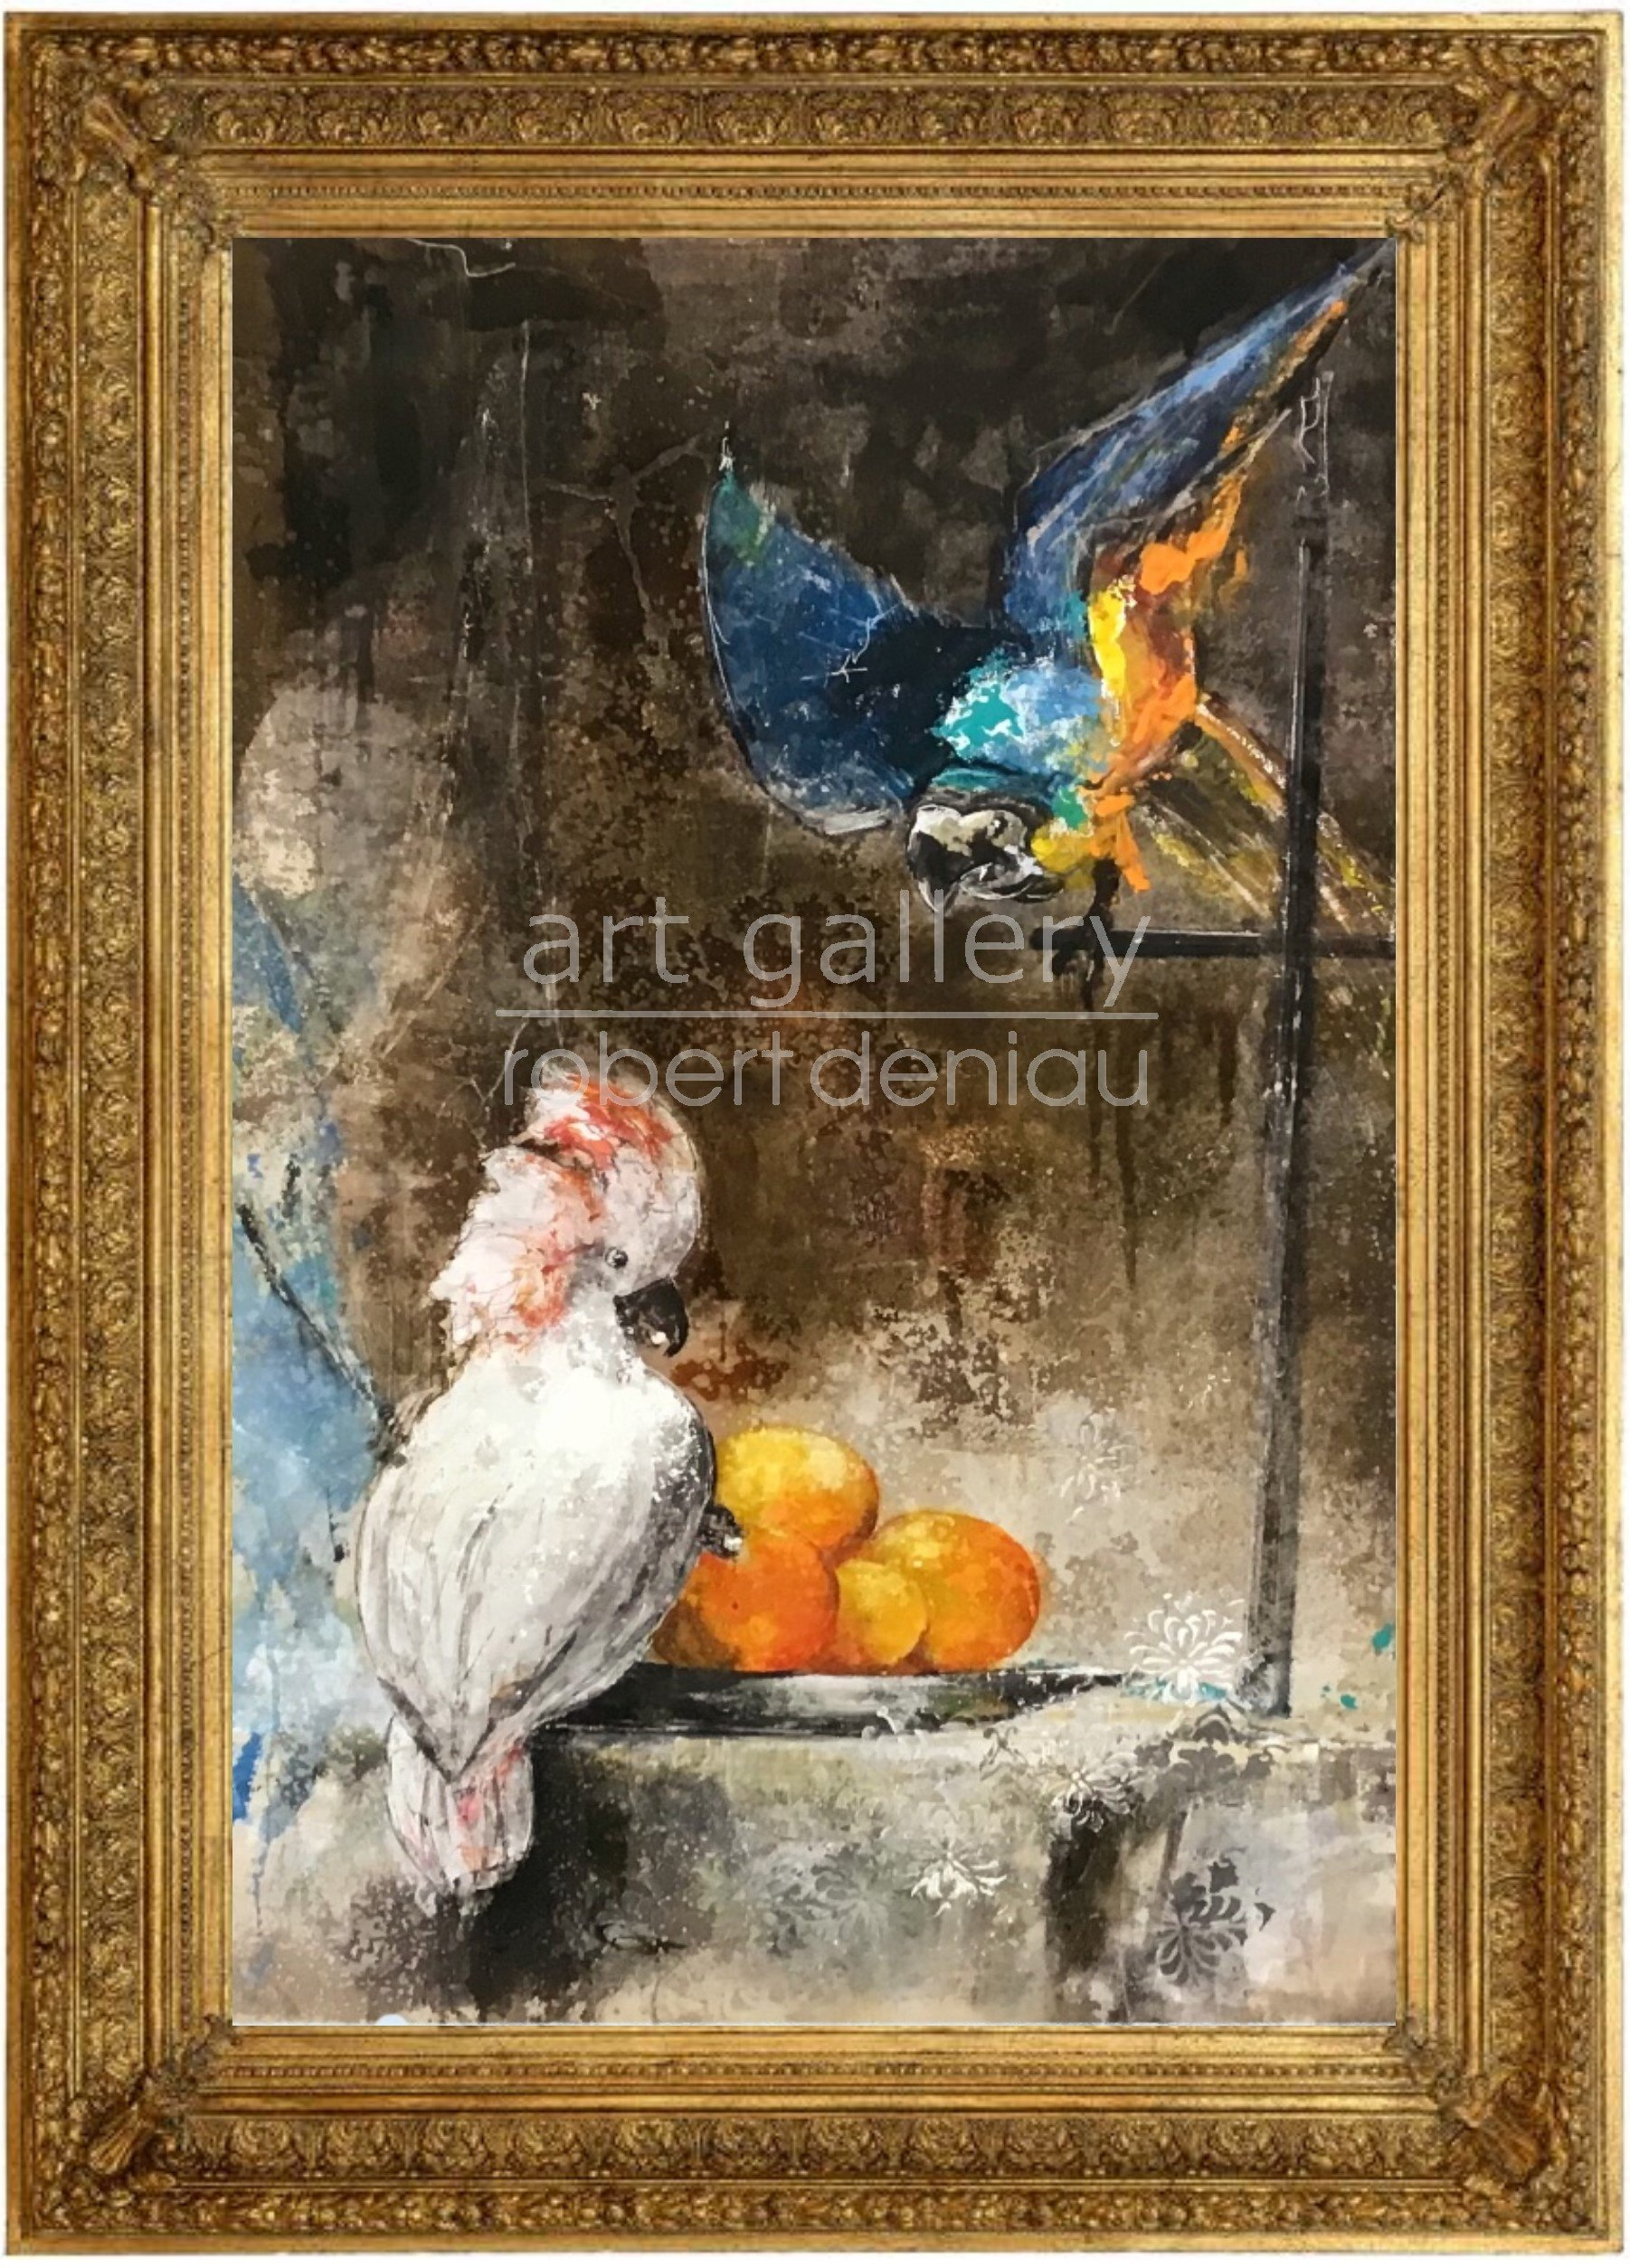 Parrots Party H106x69 cm - Framed H130x92x7 cm Mixed Media on canvas